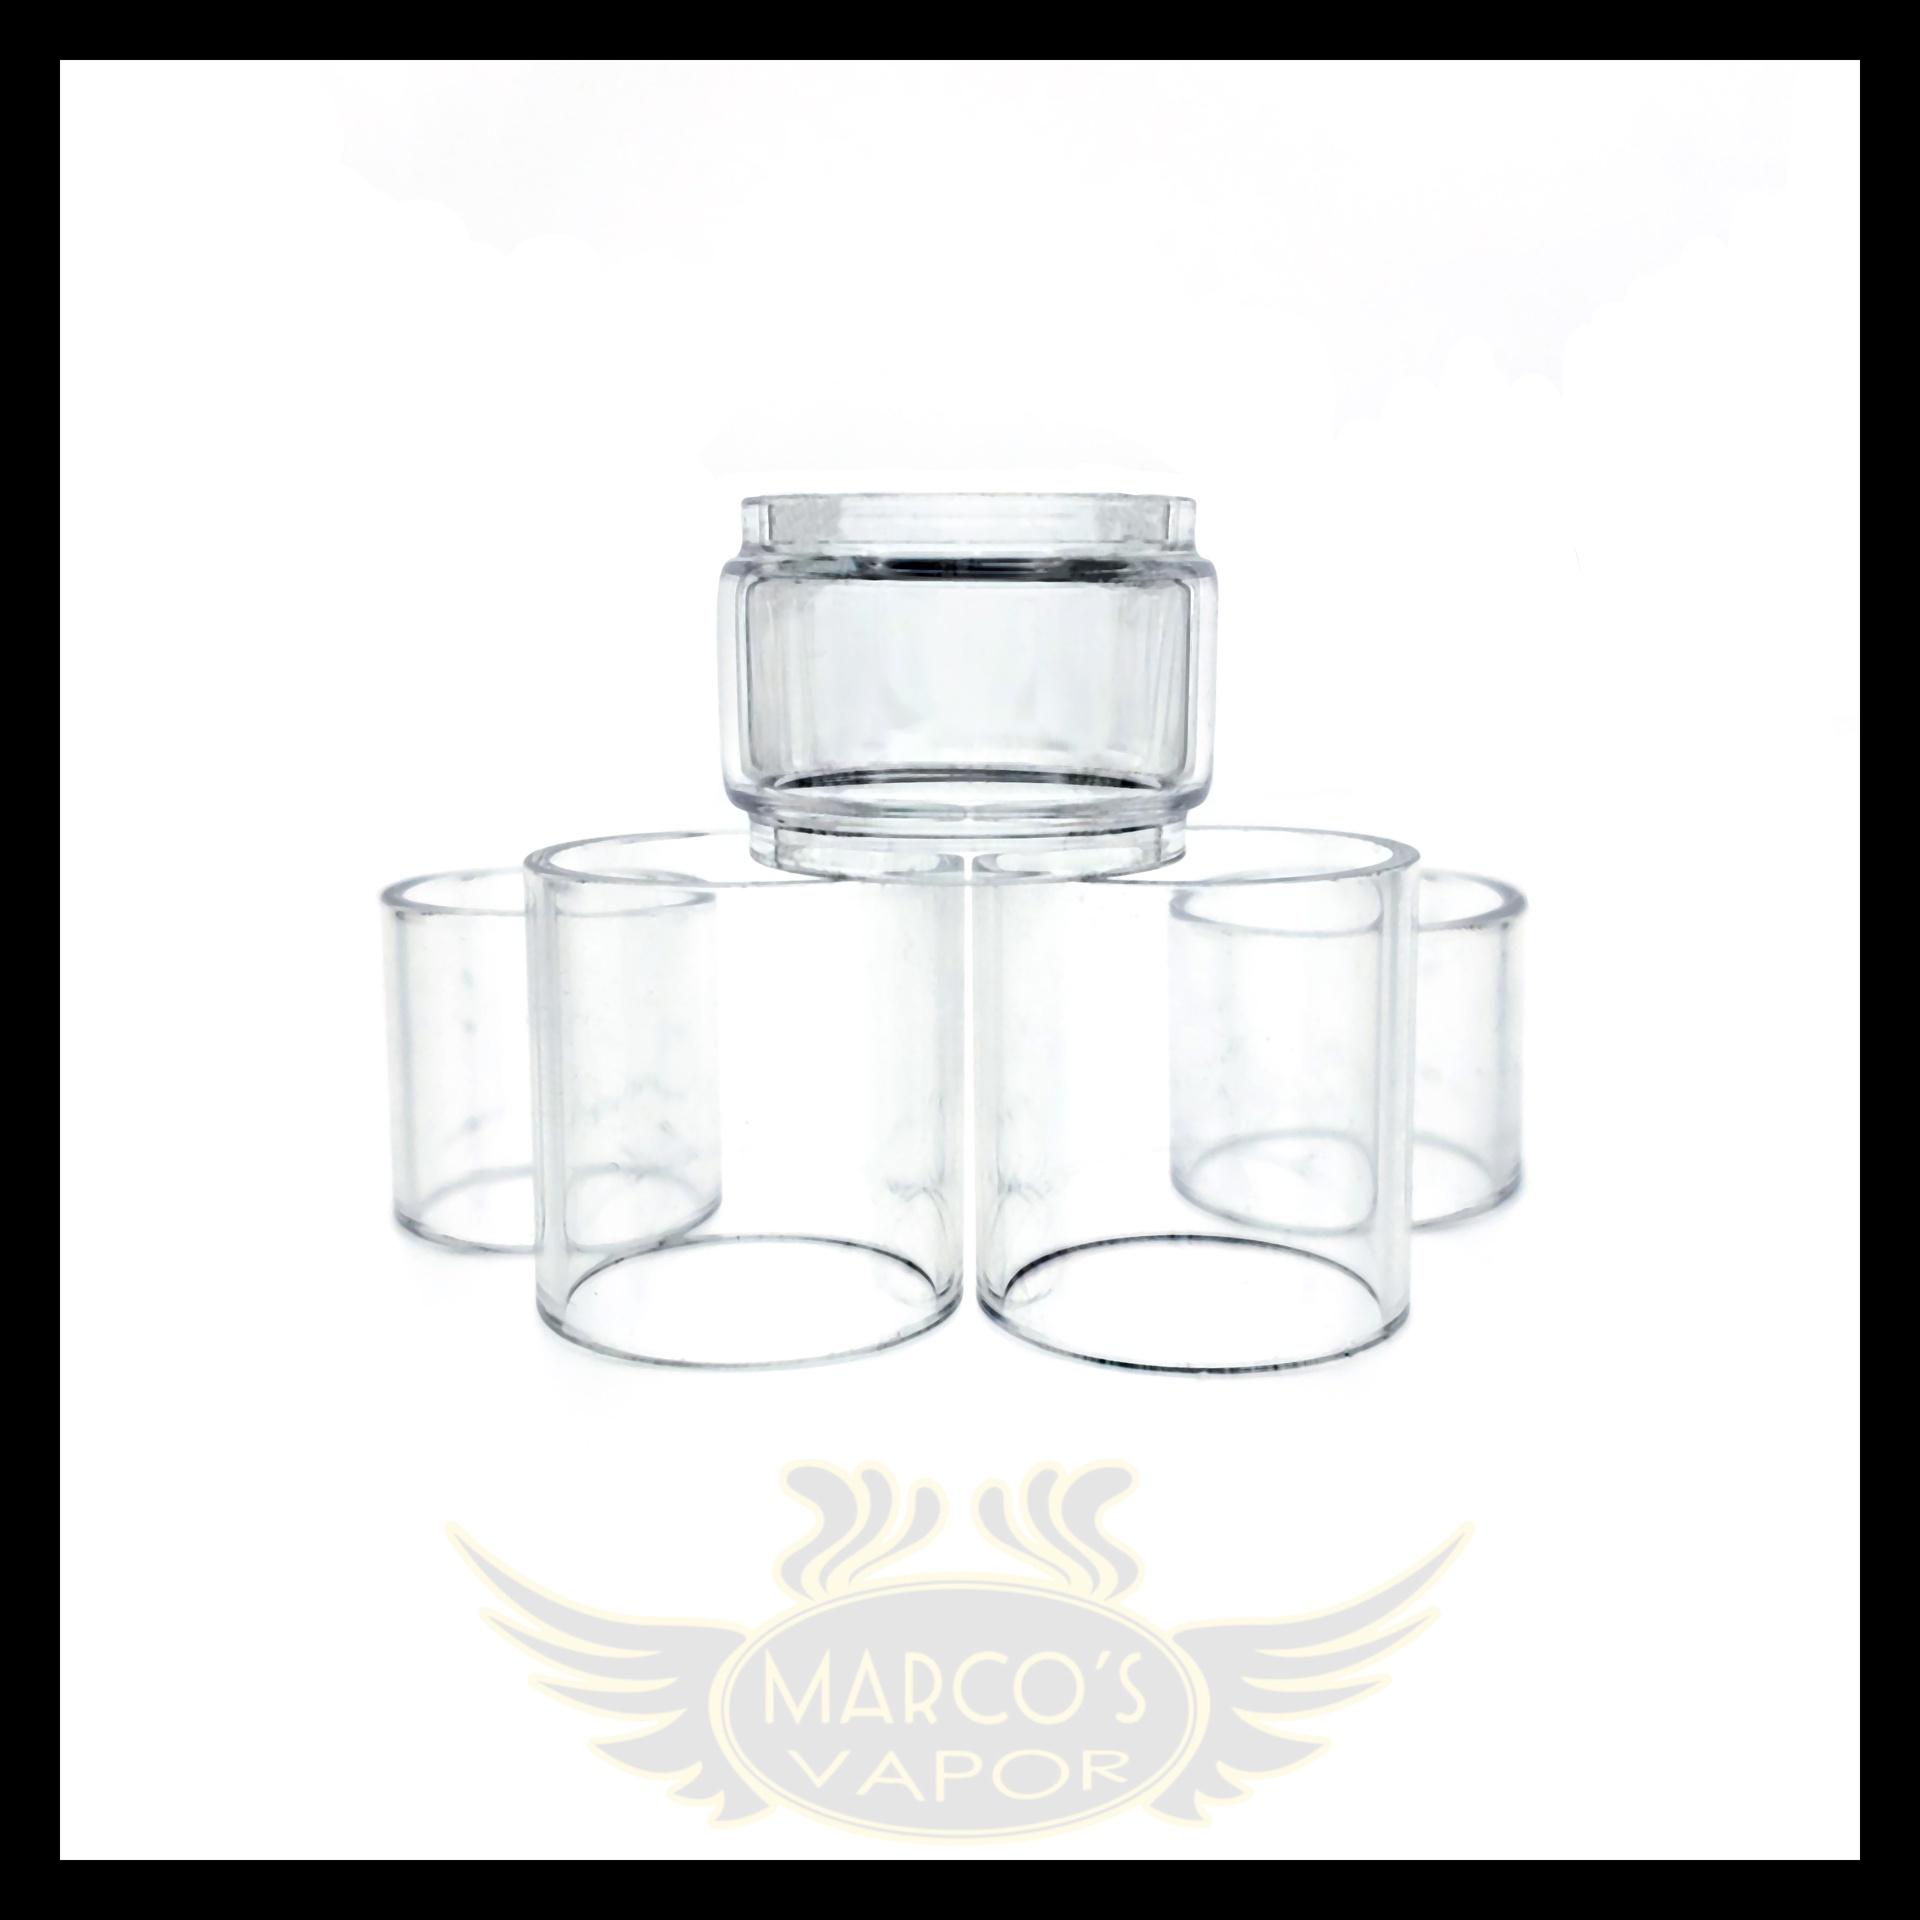 Vaporesso NRG SE Replacement Glass 2ml / 3.5ml / 4.5ml